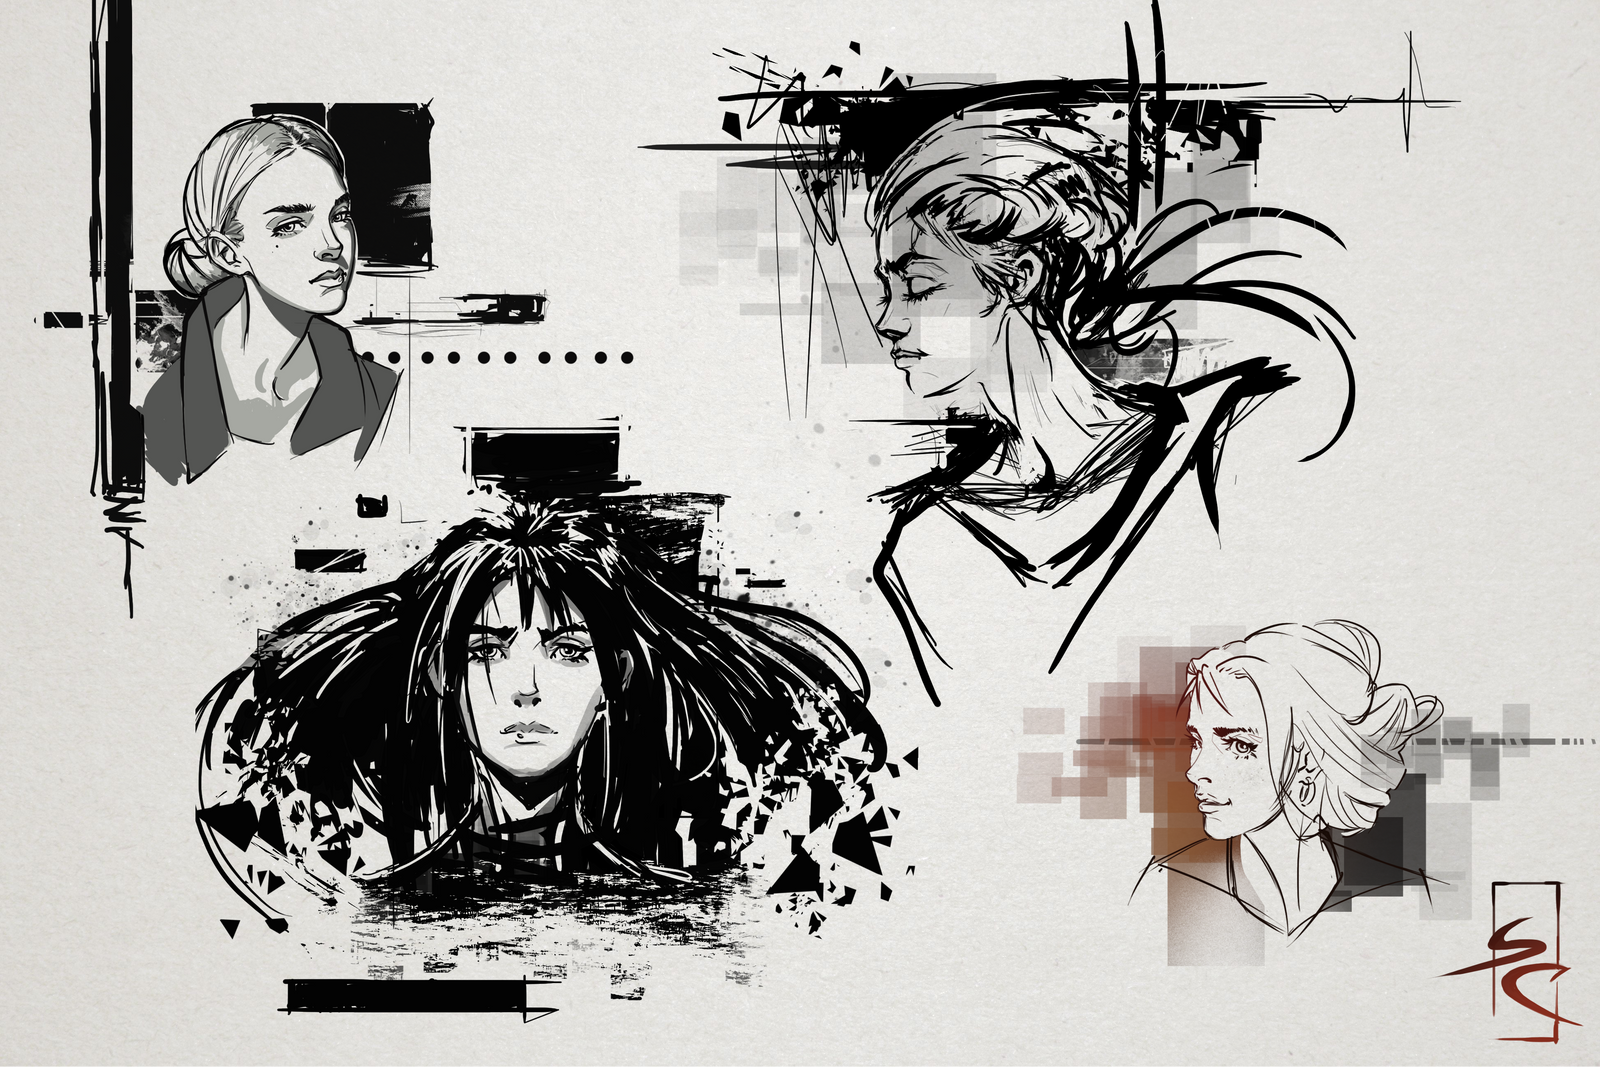 Dynamic sketching, page 4